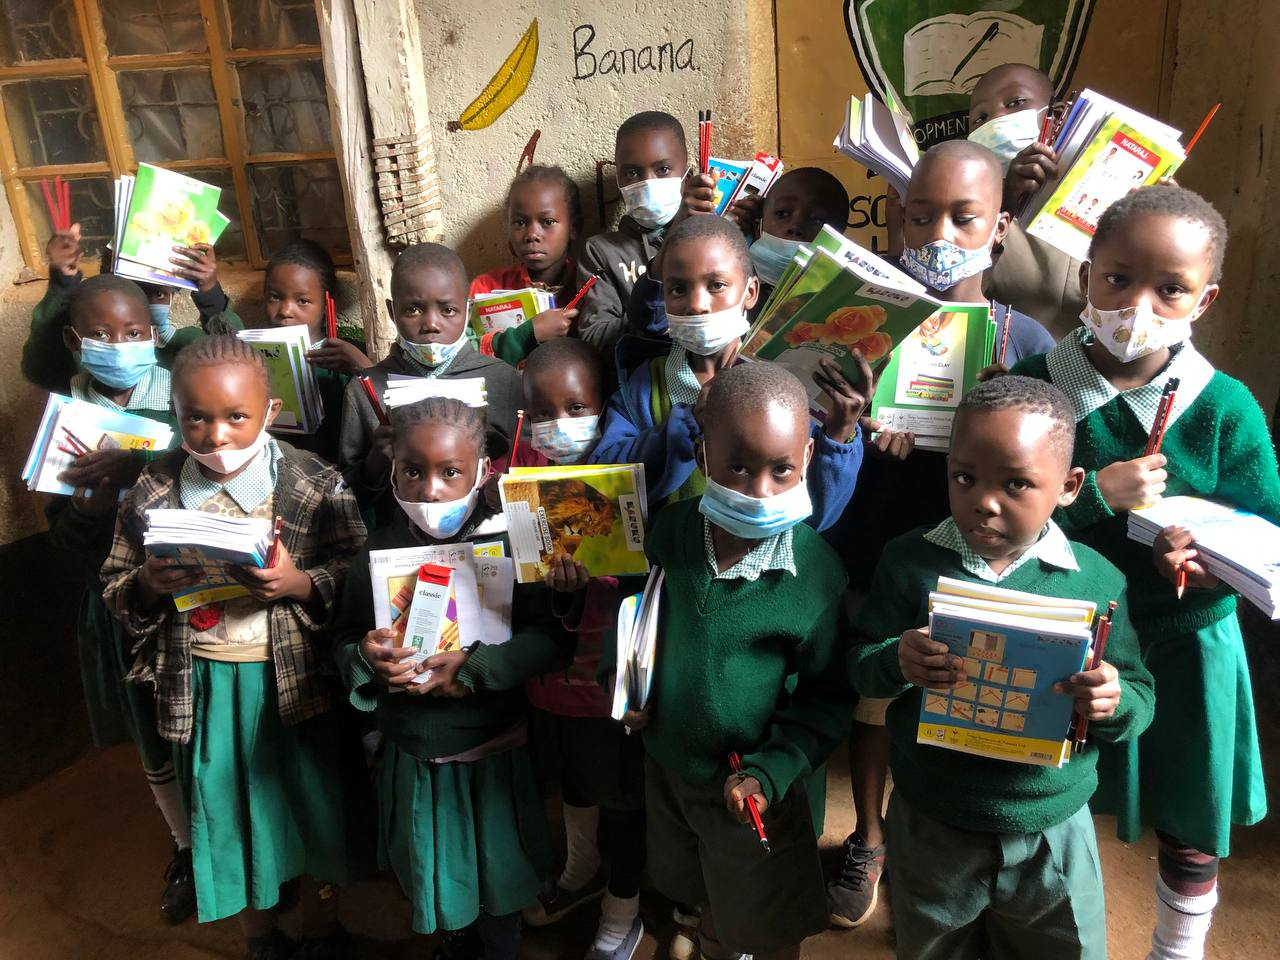 Children in Kibera with school supplies purchased by Chaffinch